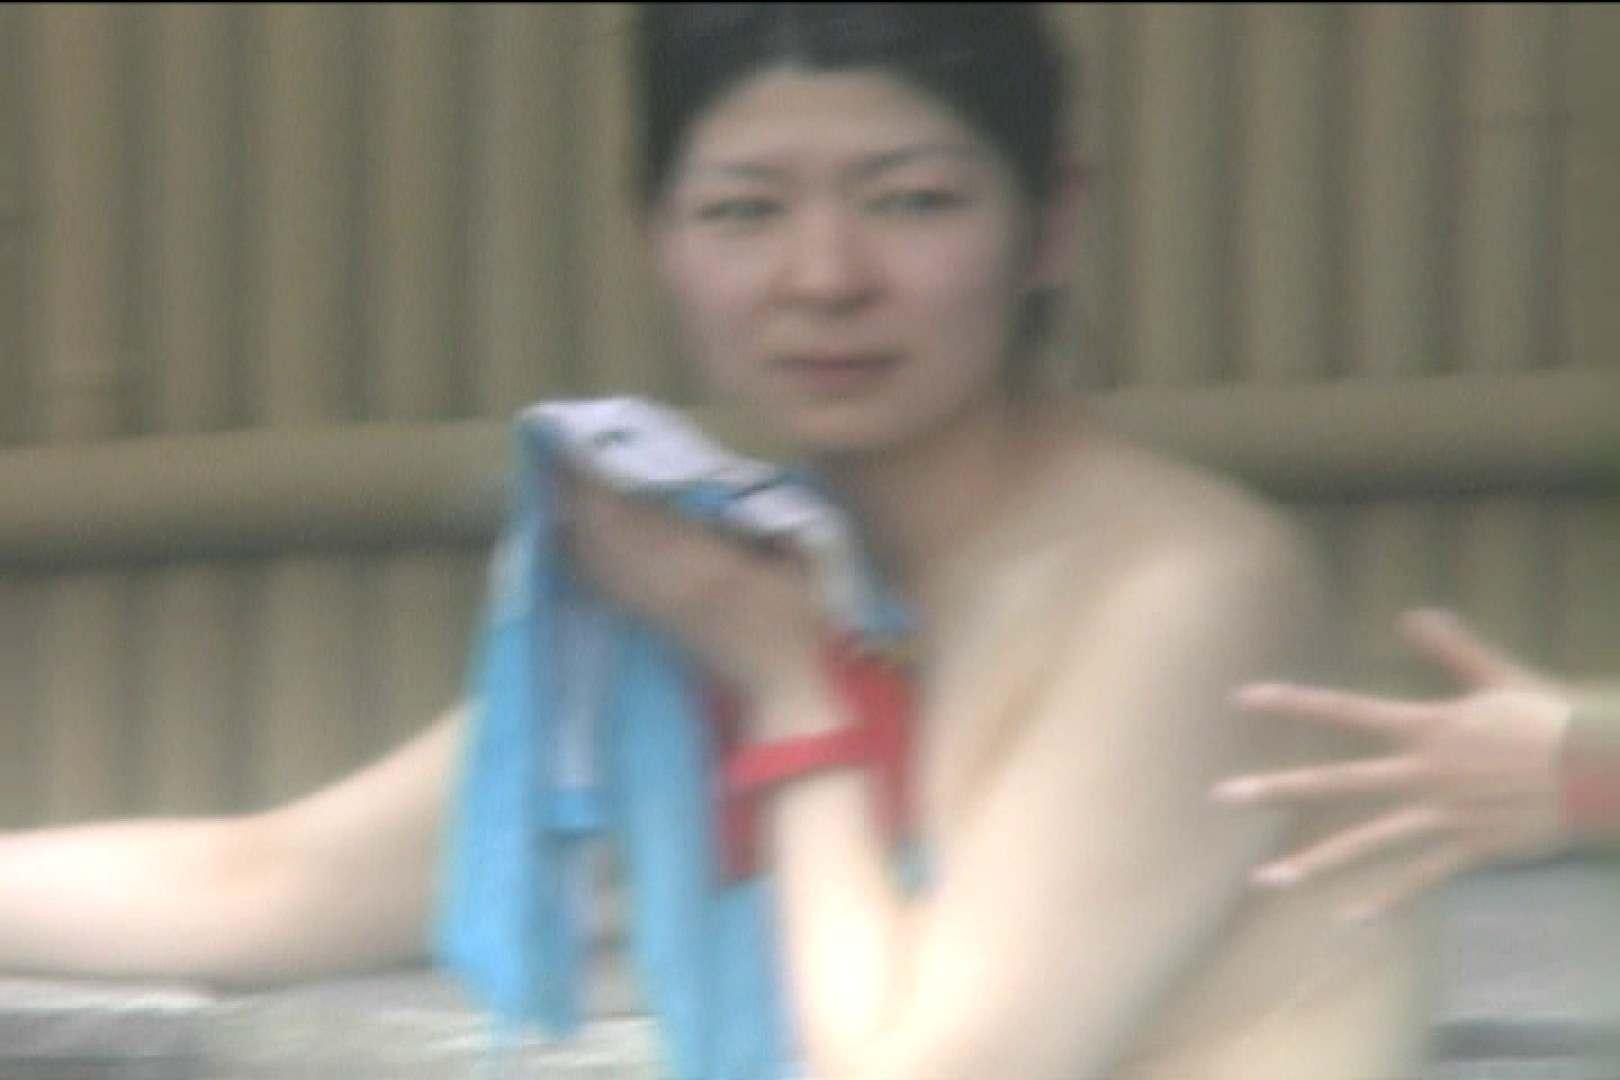 Aquaな露天風呂Vol.139 盗撮シリーズ | 露天風呂編  79PIX 25